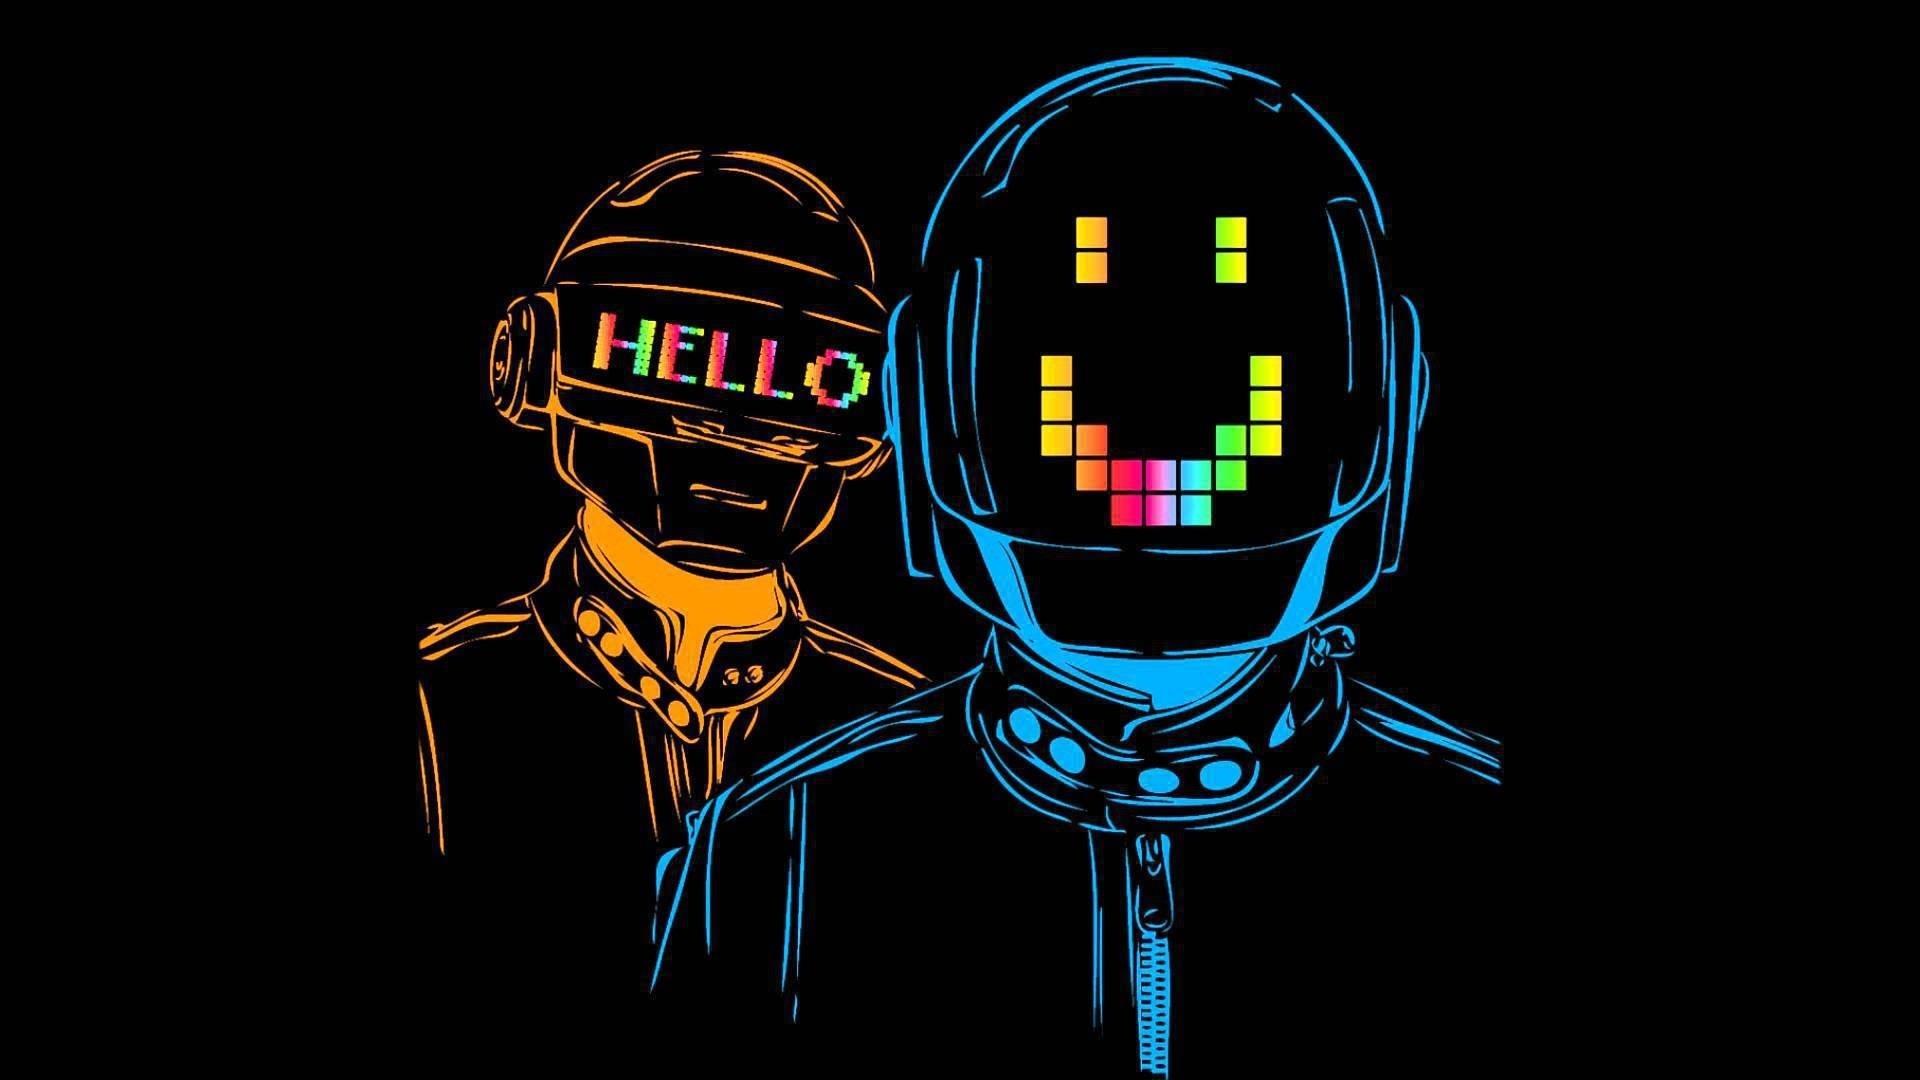 Daft Punk High Quality